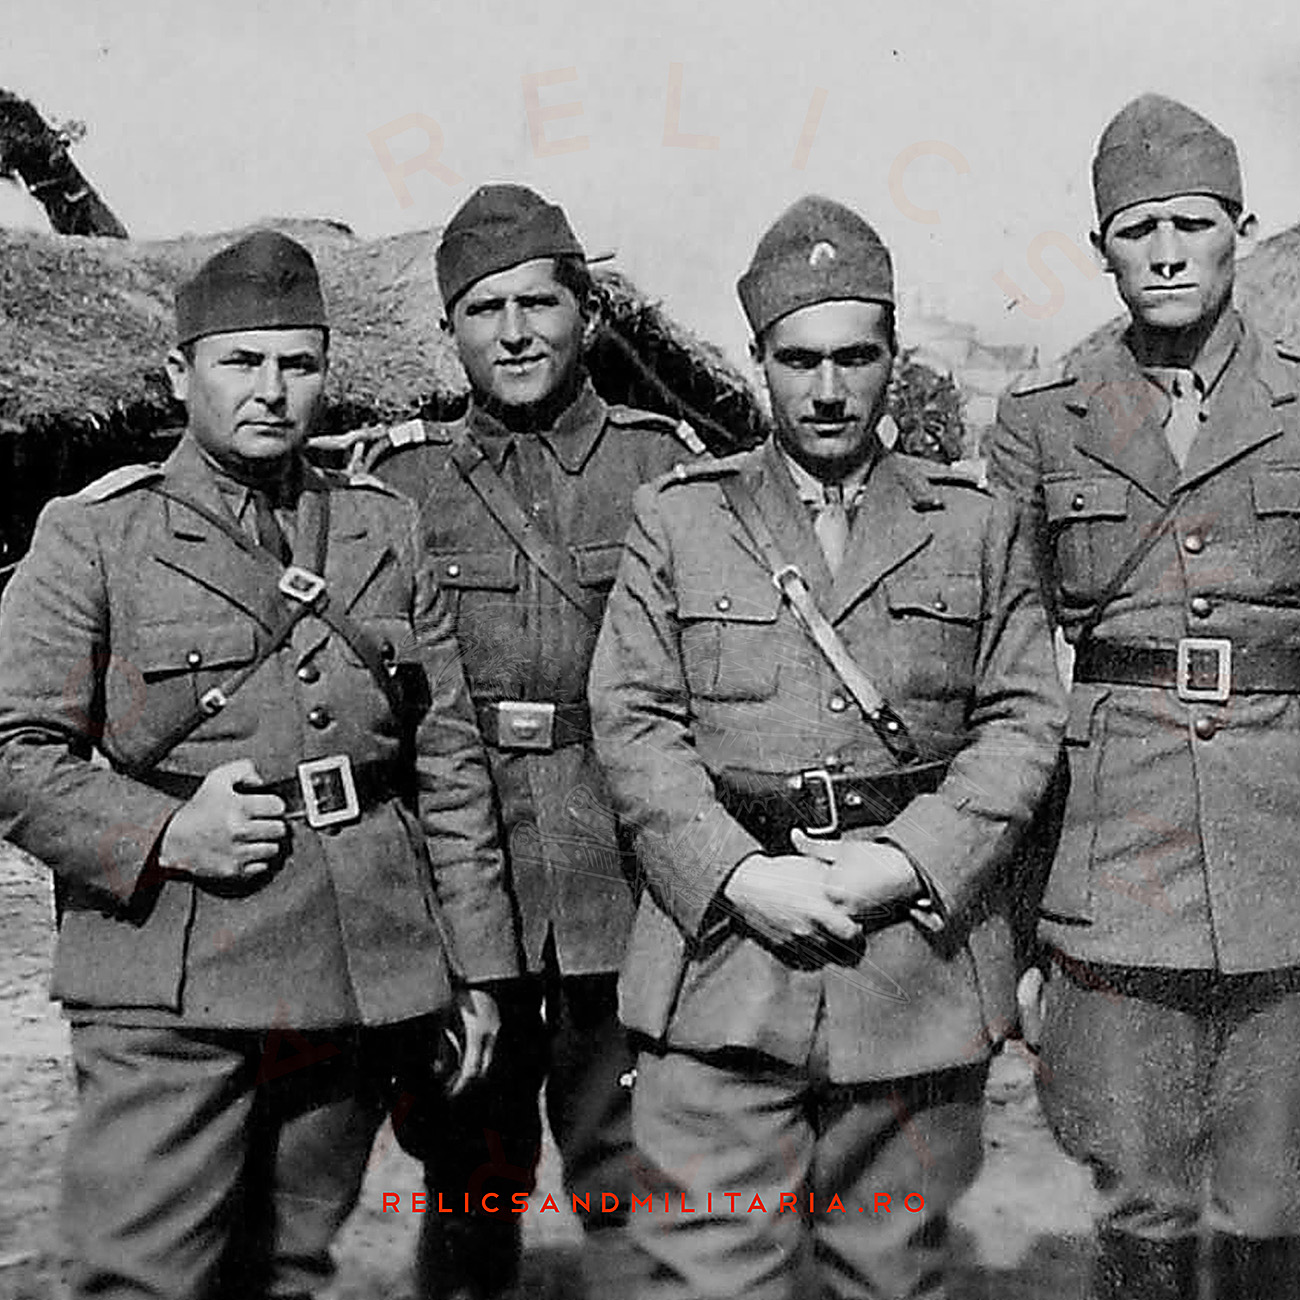 Romanian world war 2 Militaria Royal Crown belt buckle